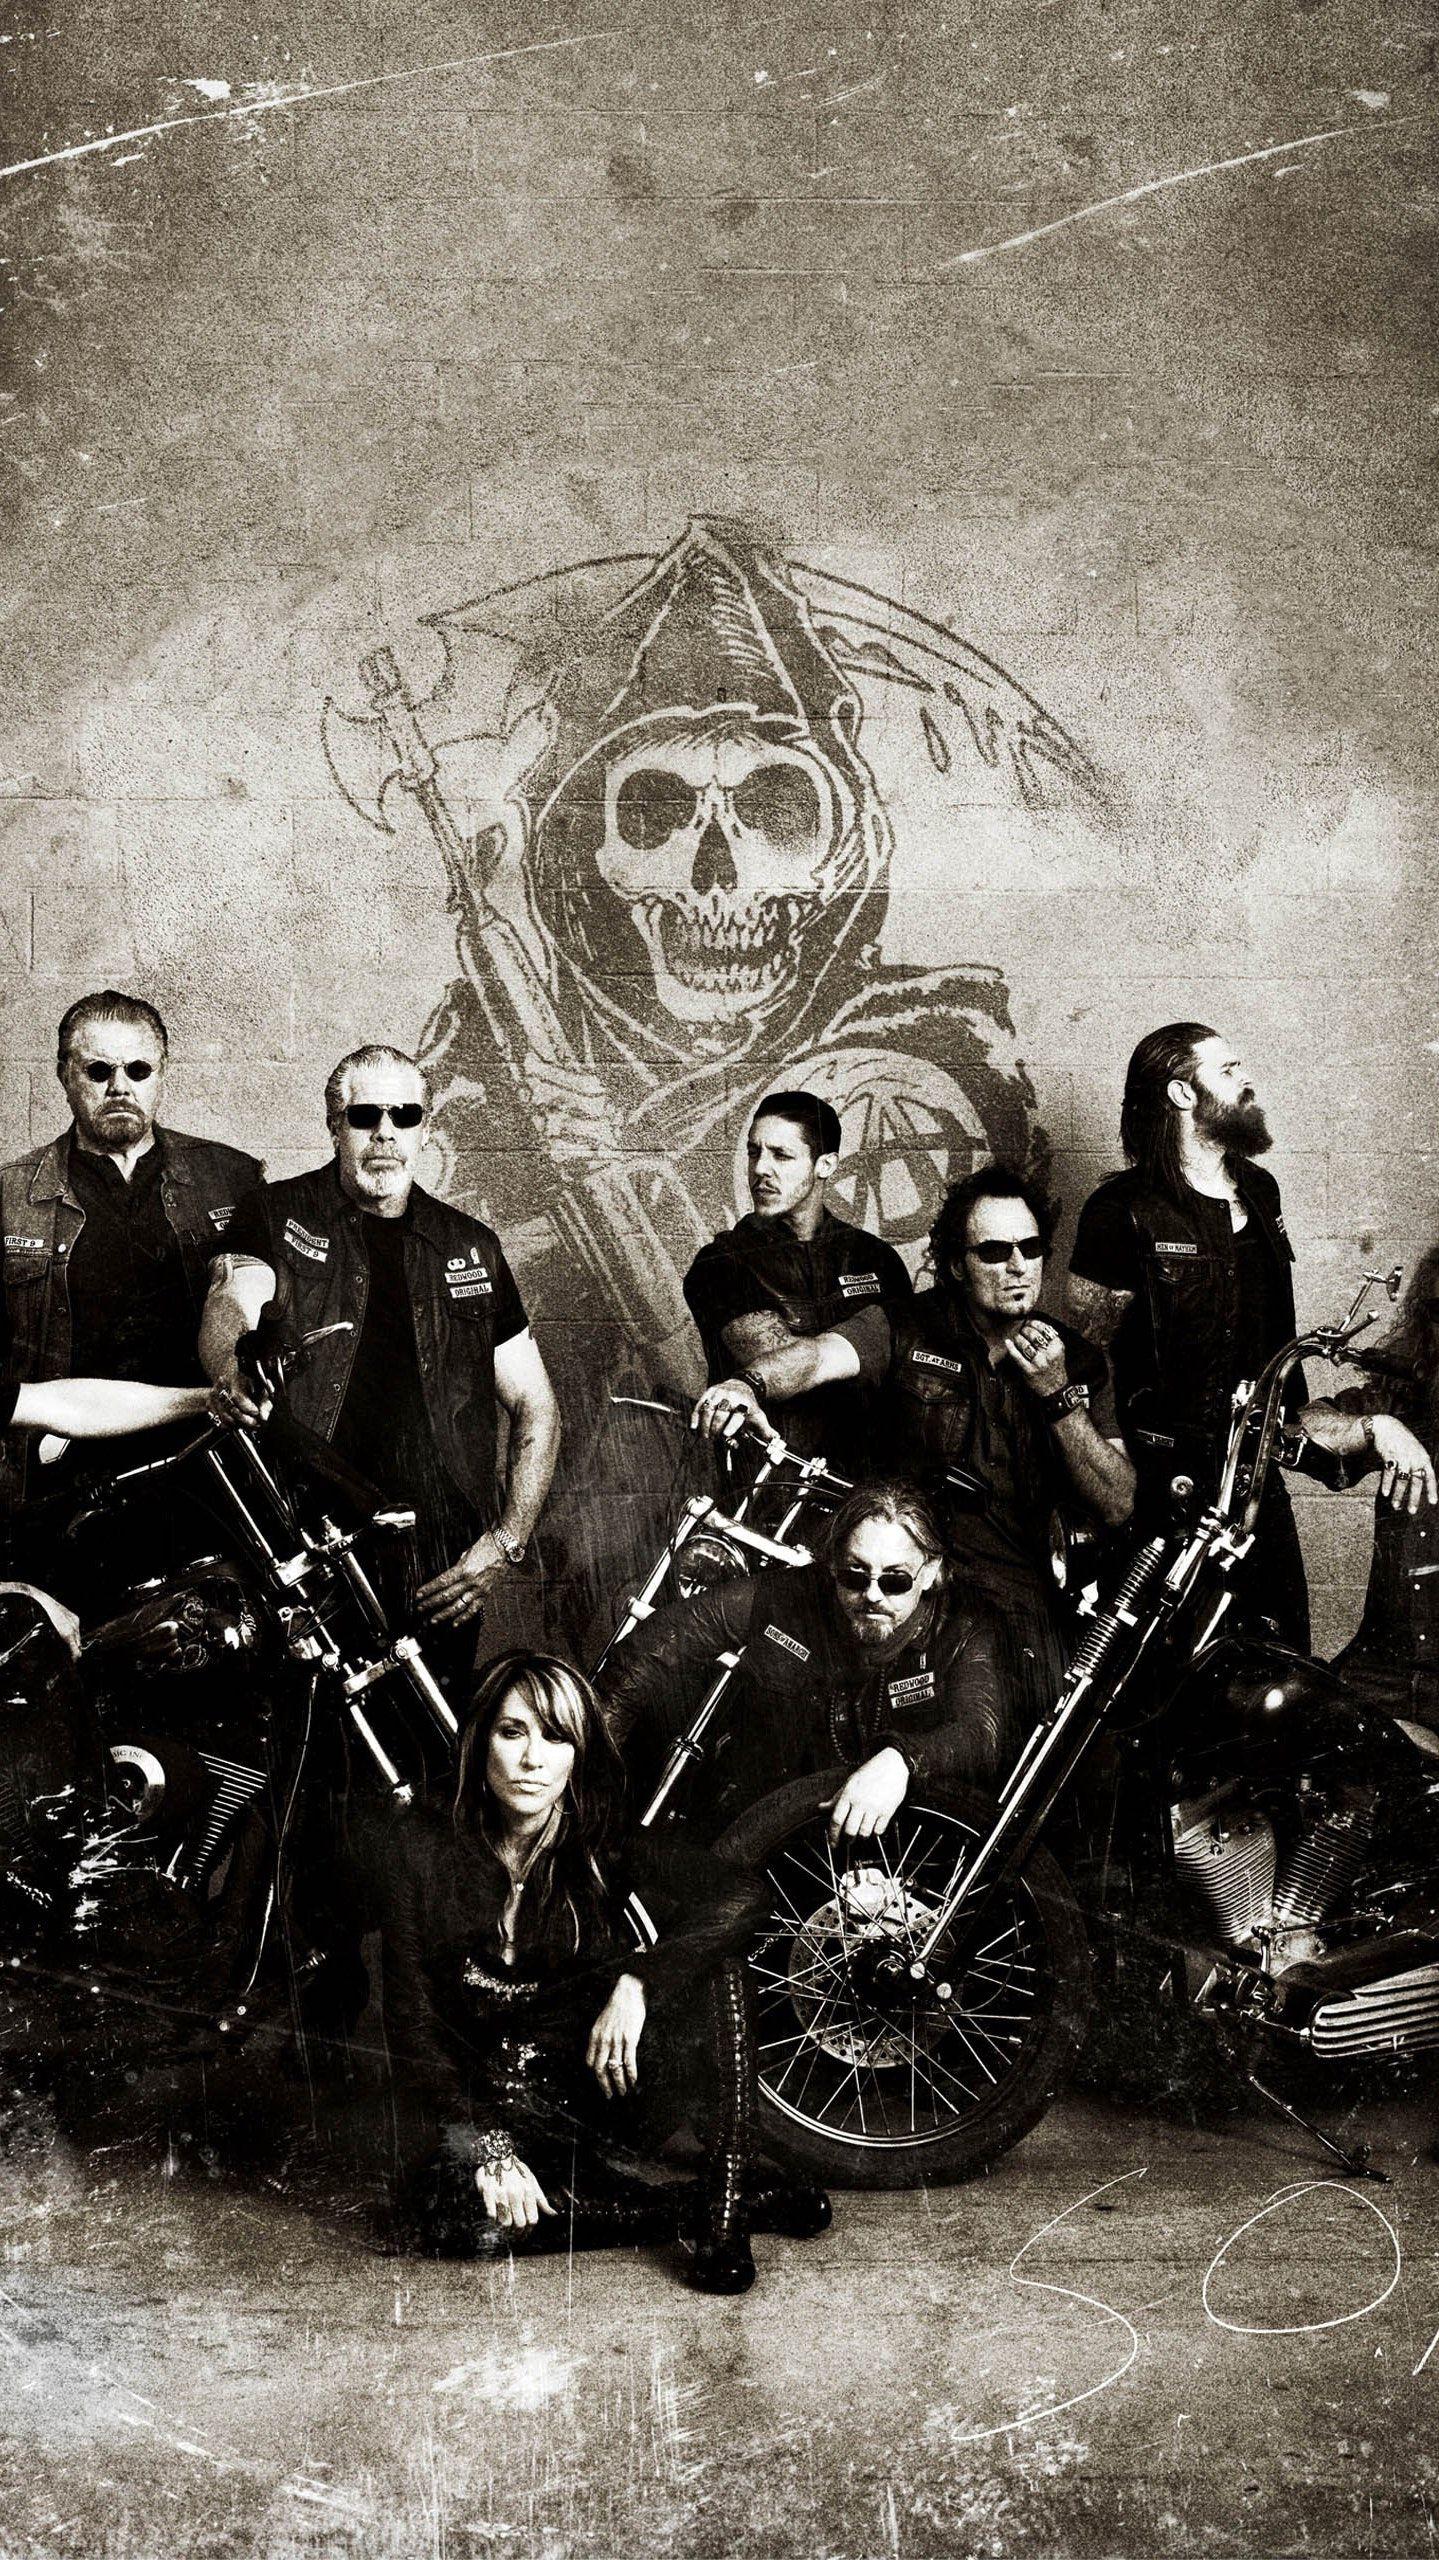 Sons Of Anarchy Wallpaper : anarchy, wallpaper, Anarchy, Phone, Wallpaper, Moviemania, Anarchy,, Samcro,, Charlie